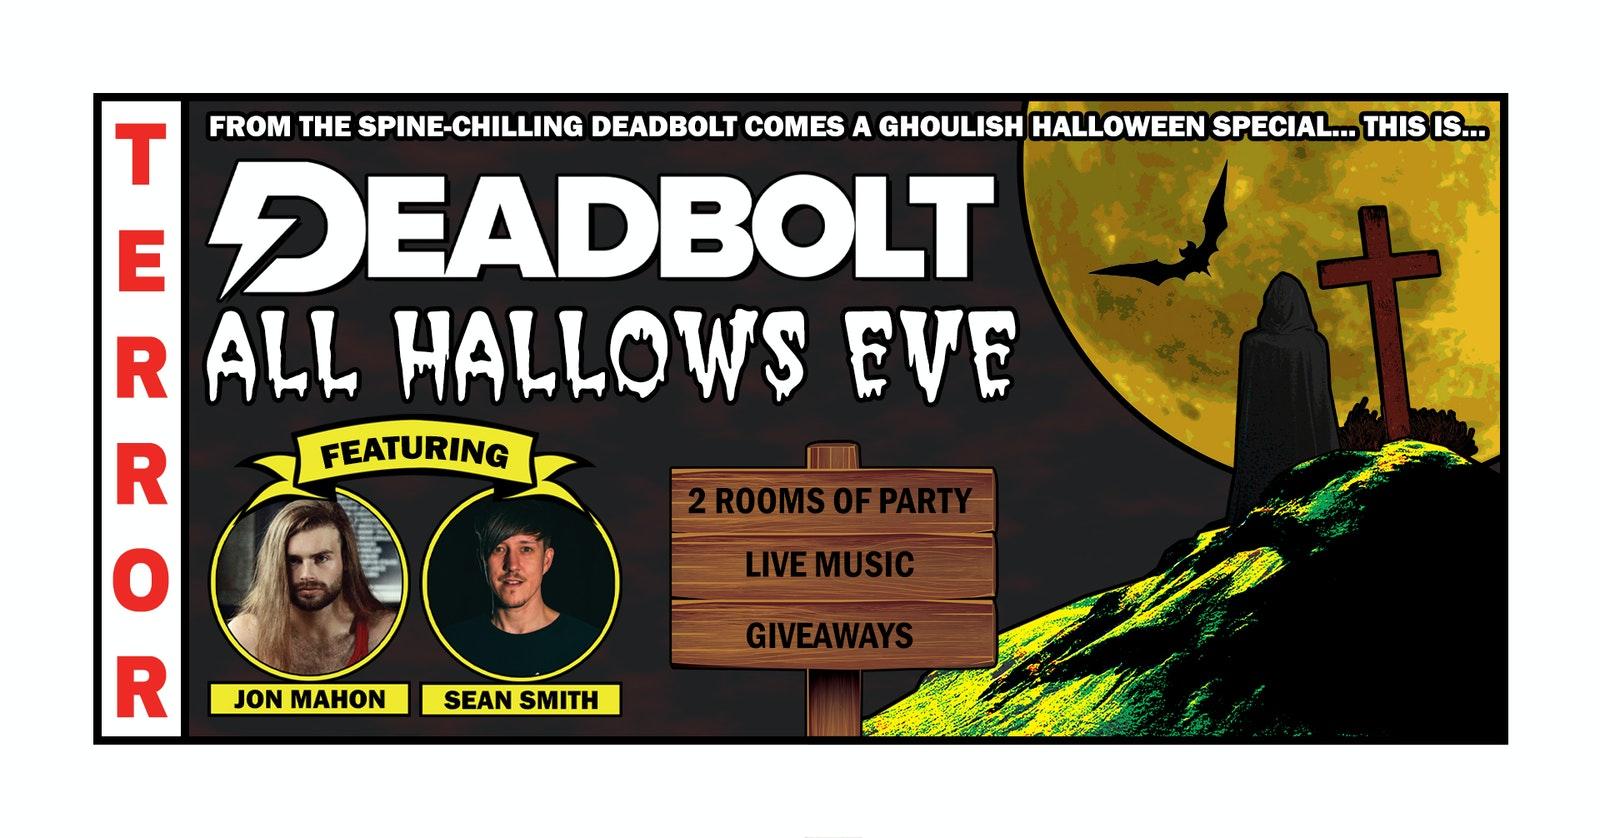 All Hallow's Eve – Deadbolt Halloween Special 2021